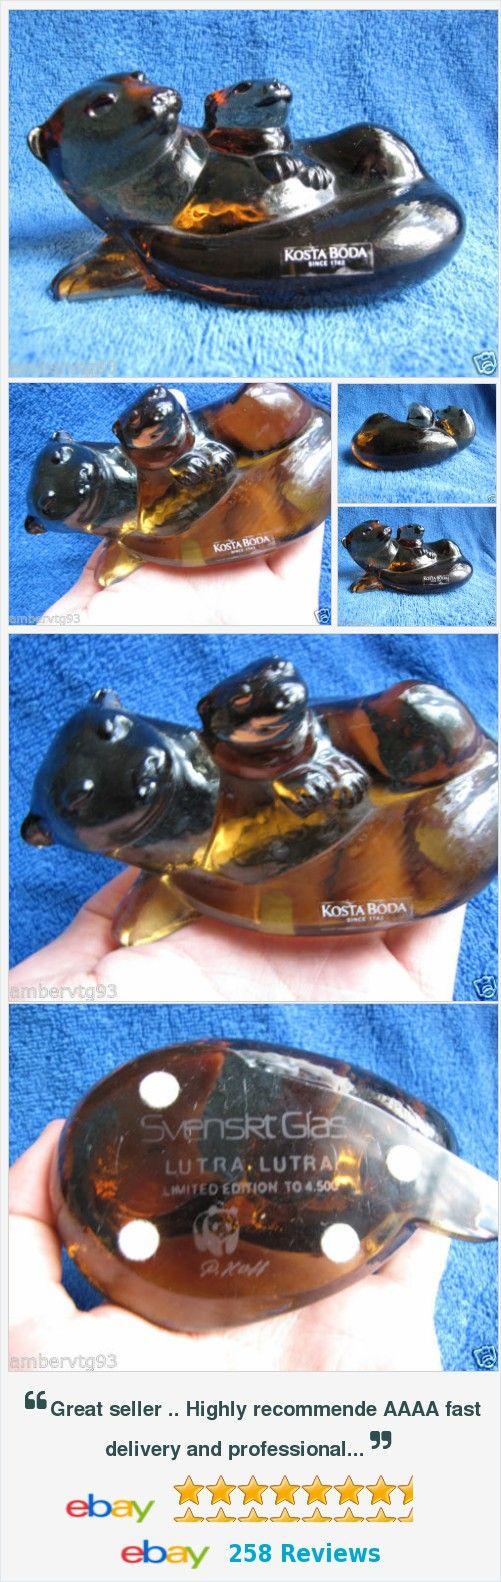 #Sweden #Kosta #Boda Paul #Hoff #art #glass #figurine #figure #Utter #WWF #animals limited #COLLECTIBLE  For sale #Scandinavian art glass #vintage Home #decor #design http://www.ebay.com/itm/-/121989926785?